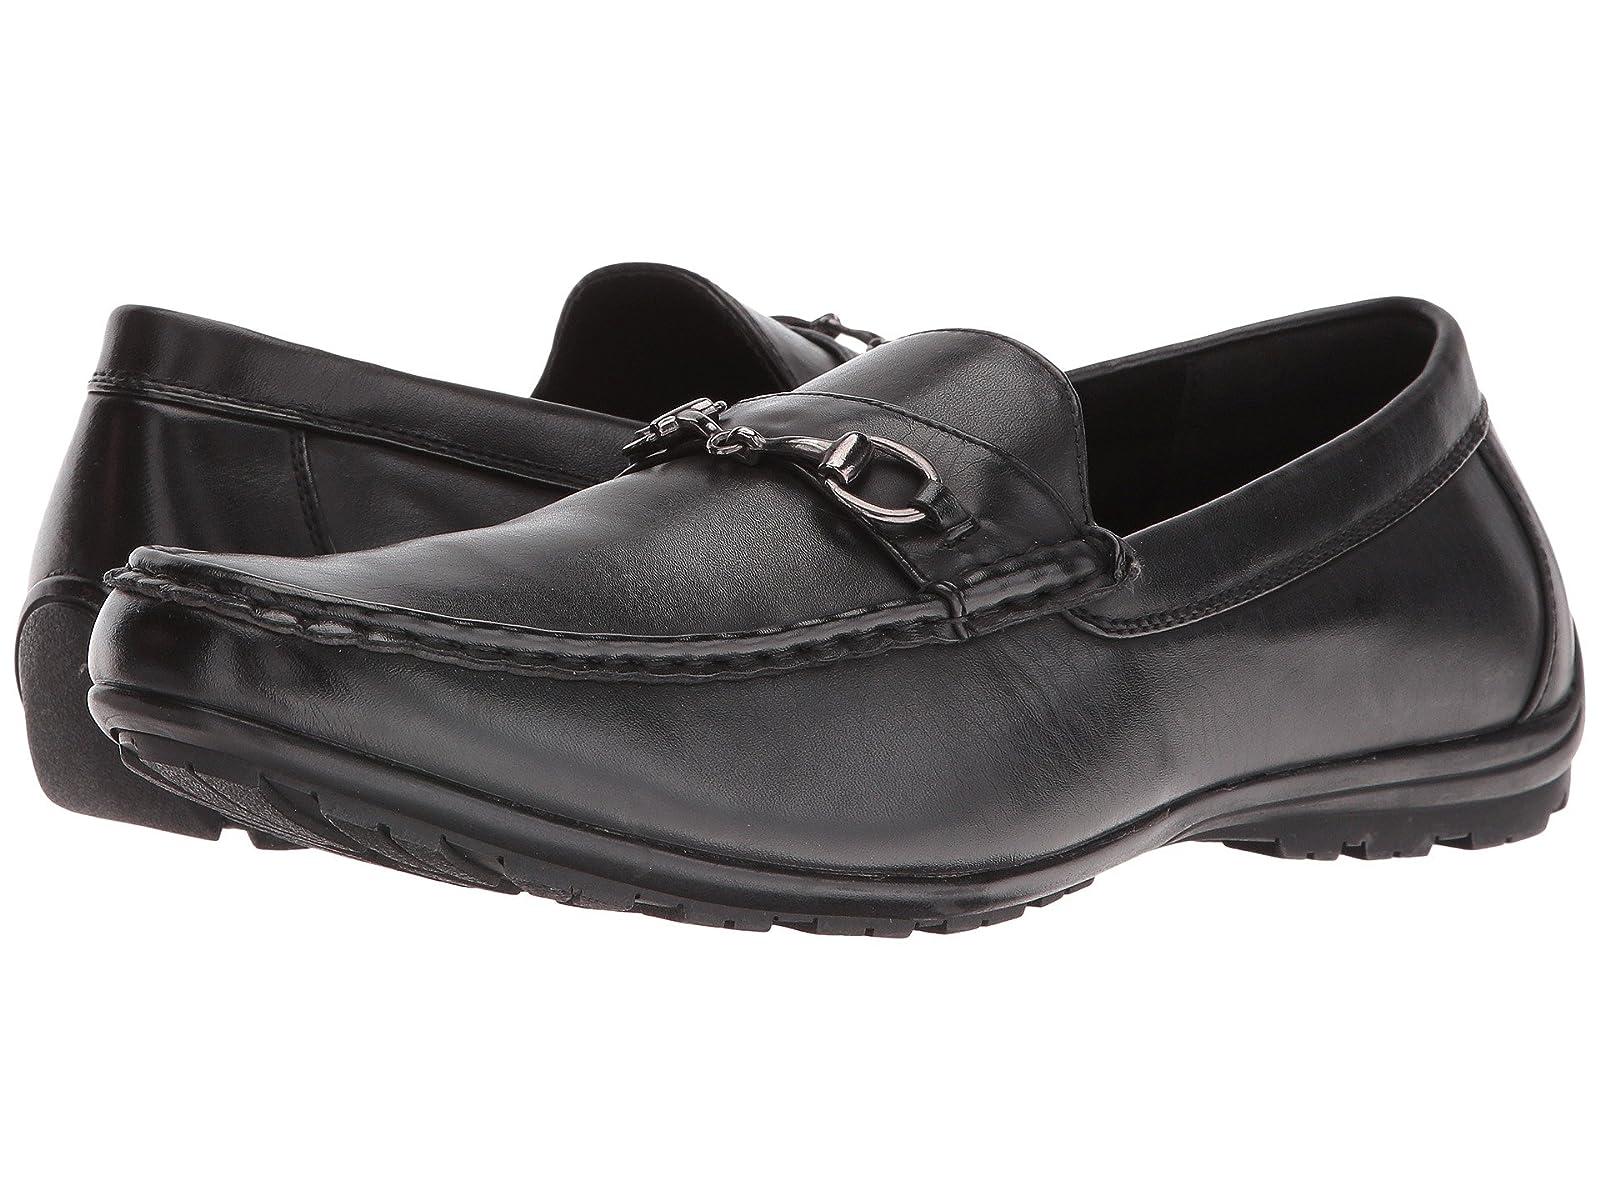 Deer Stags ManualAtmospheric grades have affordable shoes